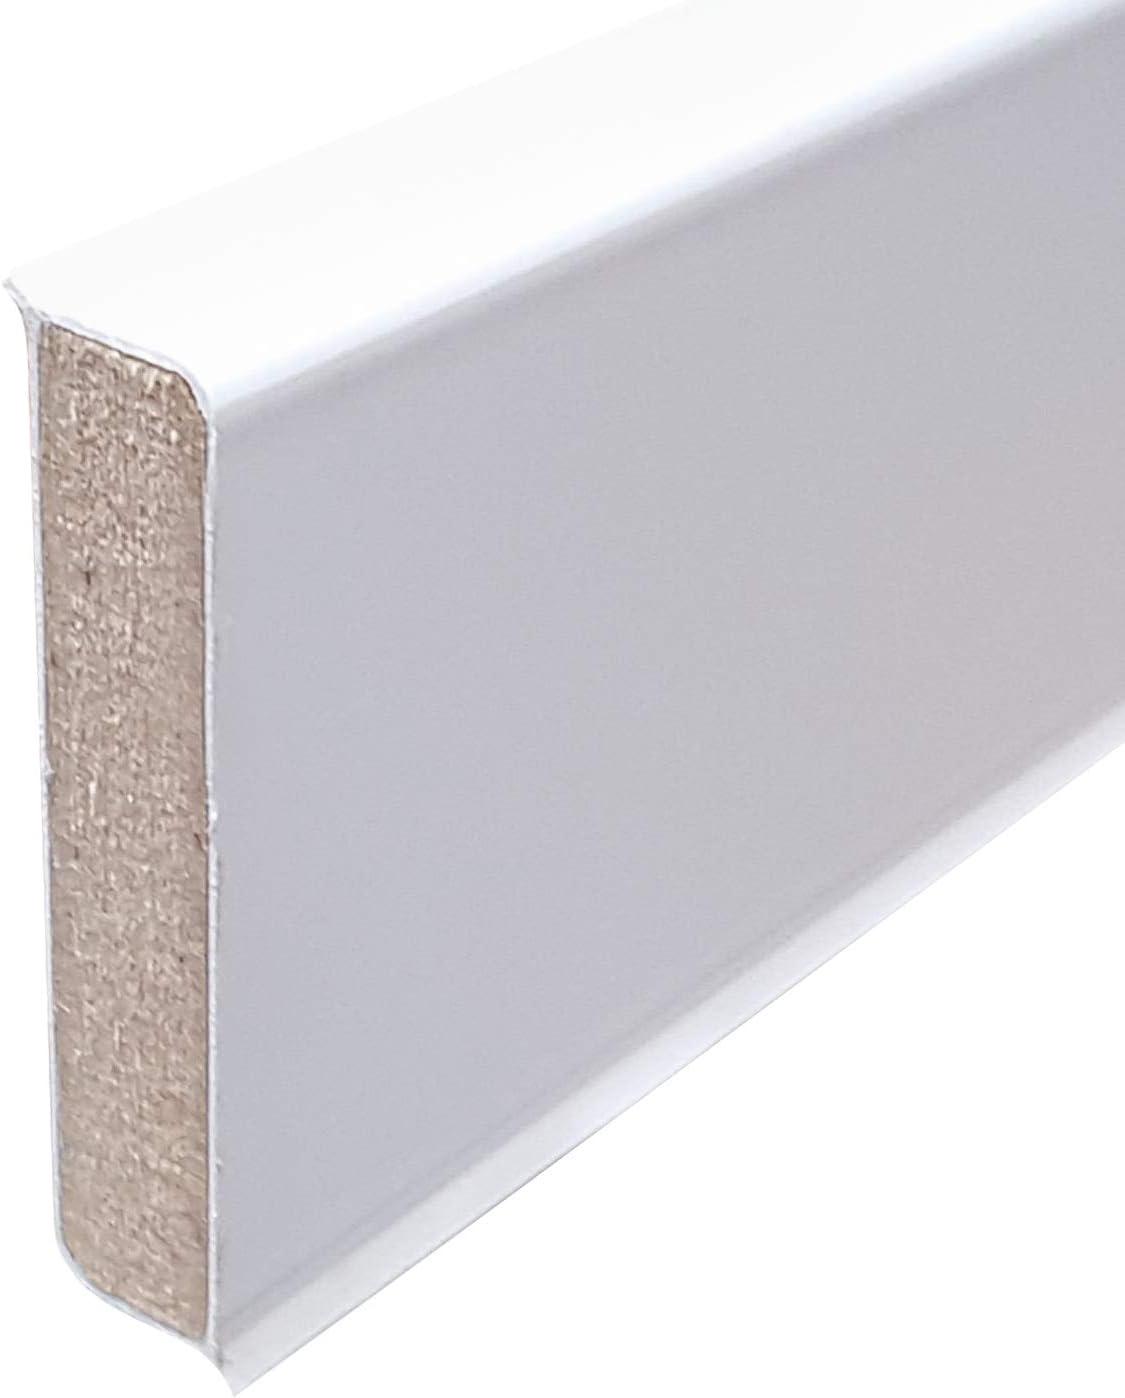 wei/ß f/ür vinyl a 2,5 lfm 3,27 EUR//lfm 81,80 /€//Verpackungseinheit 10x2,5m Cubu flex life Design Sockelleiste 60mm 12,6x40mm 10 St/ück